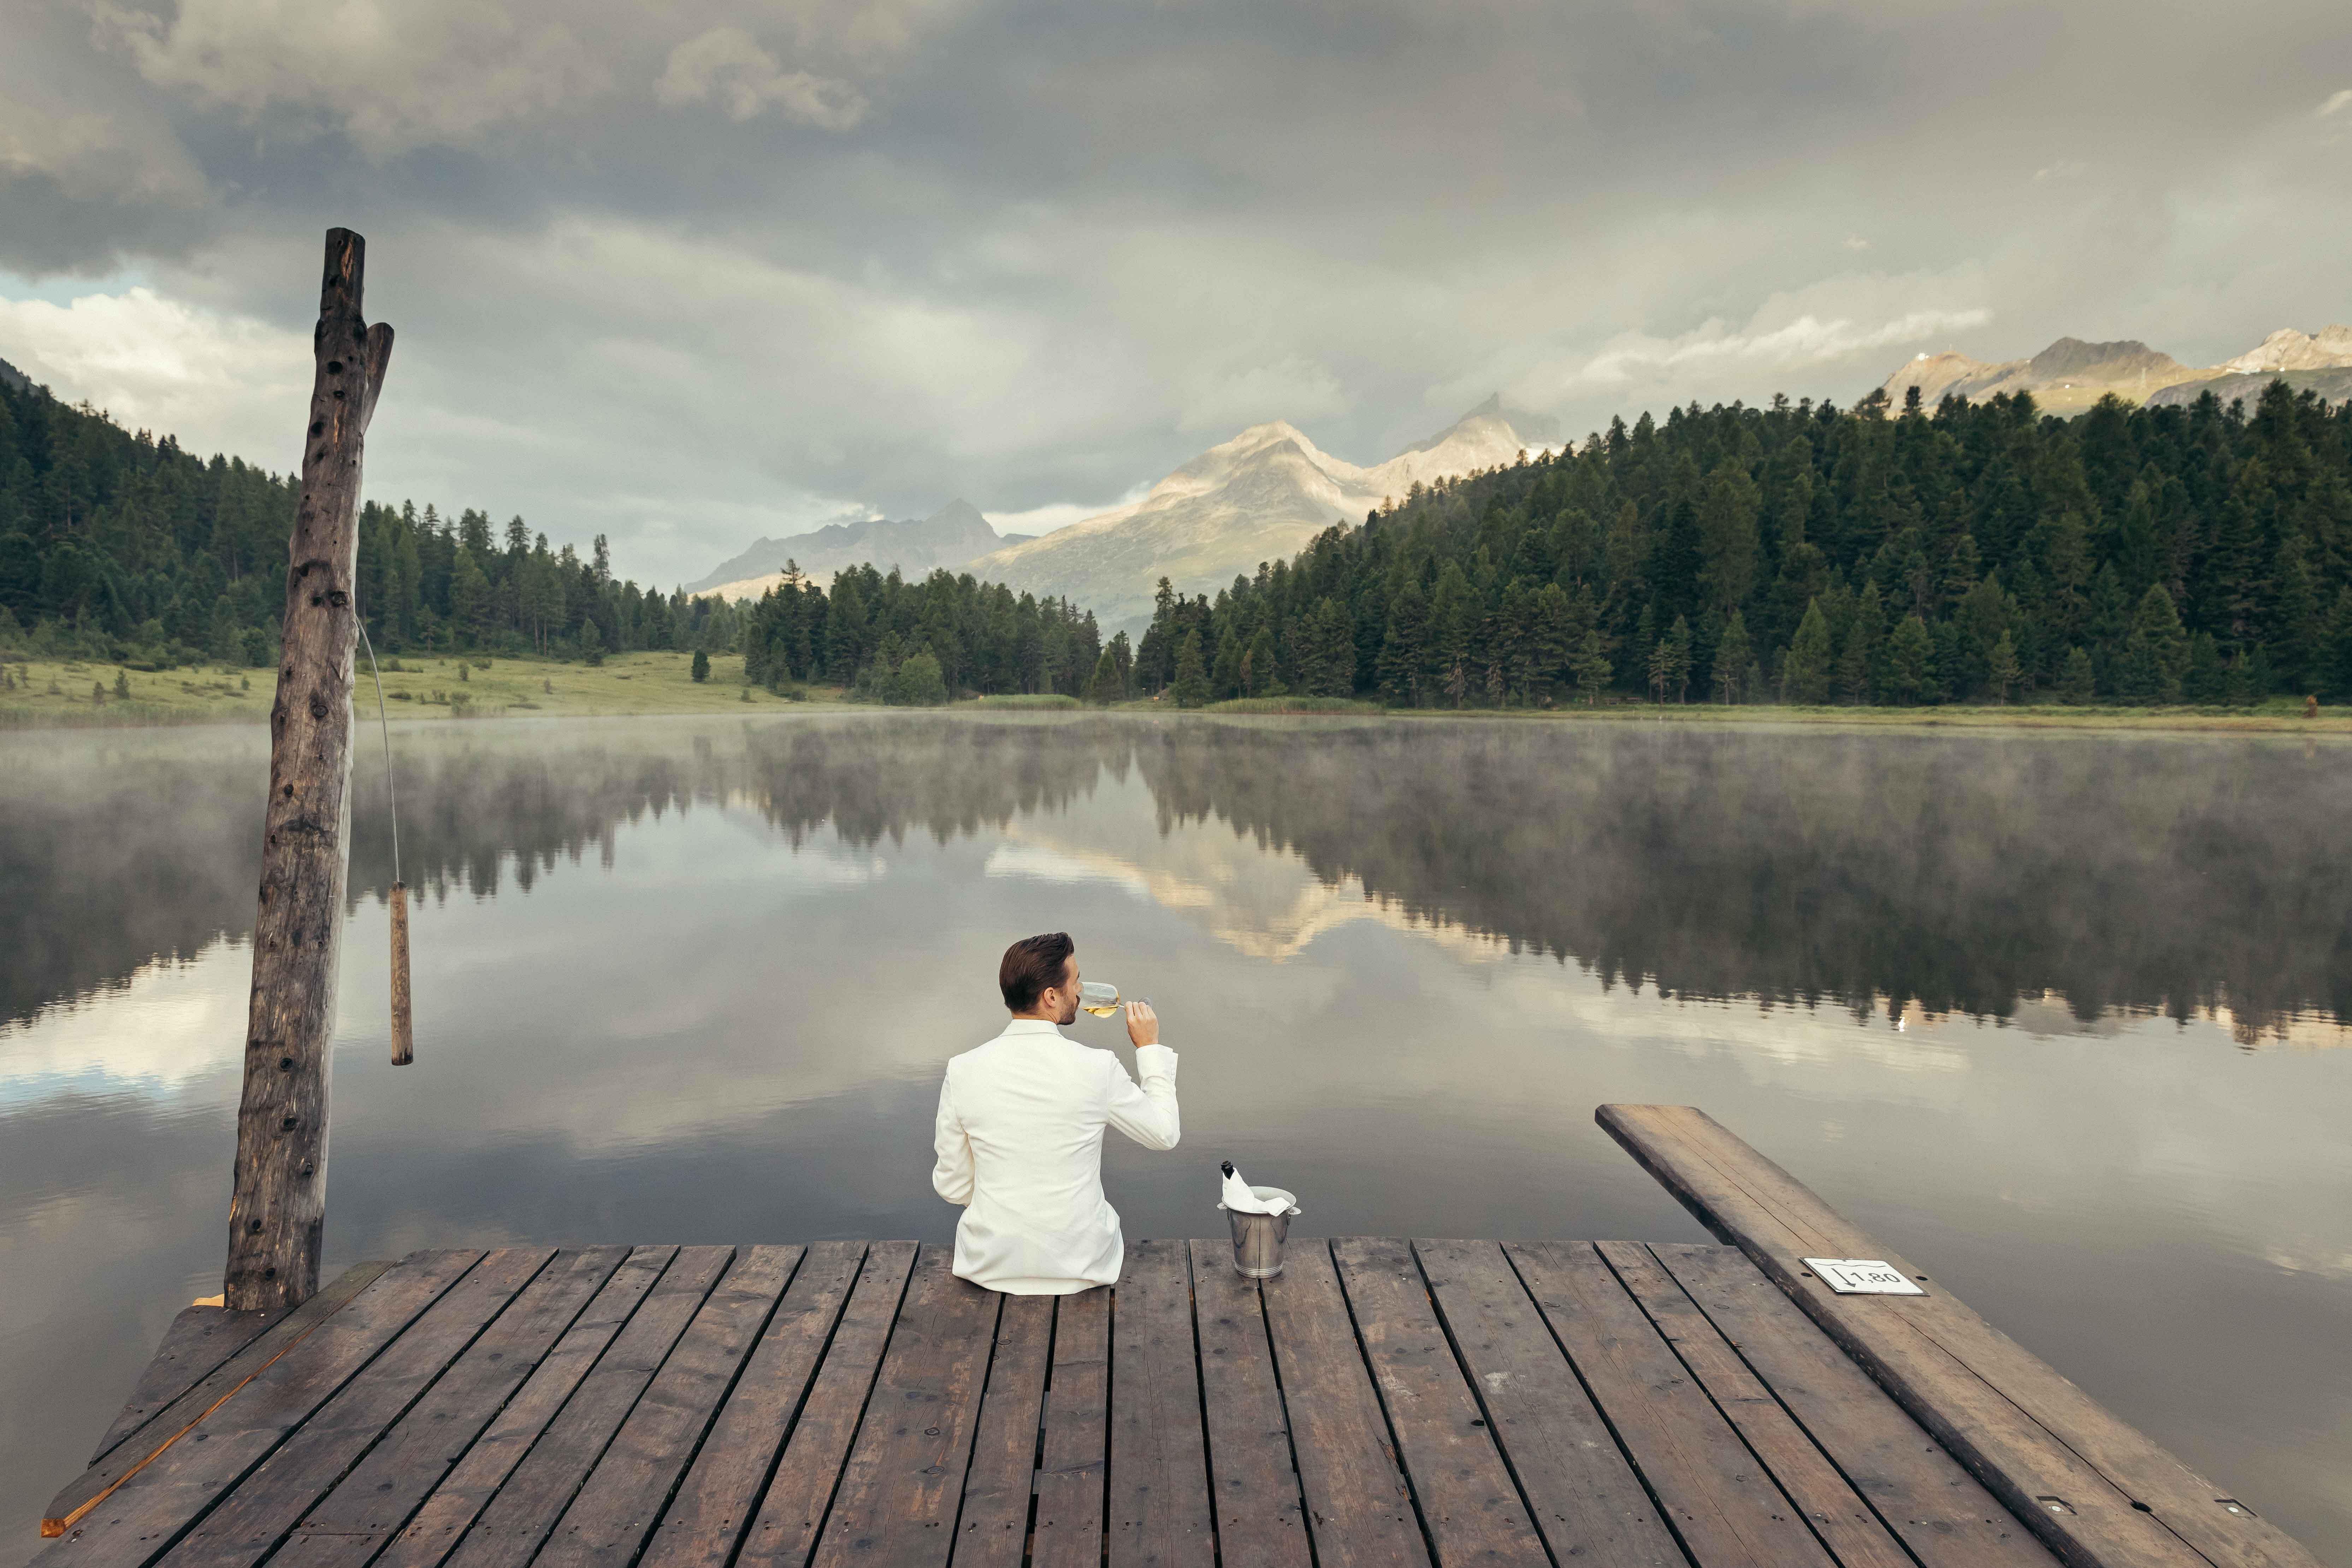 The St. Moritz Lifestyle